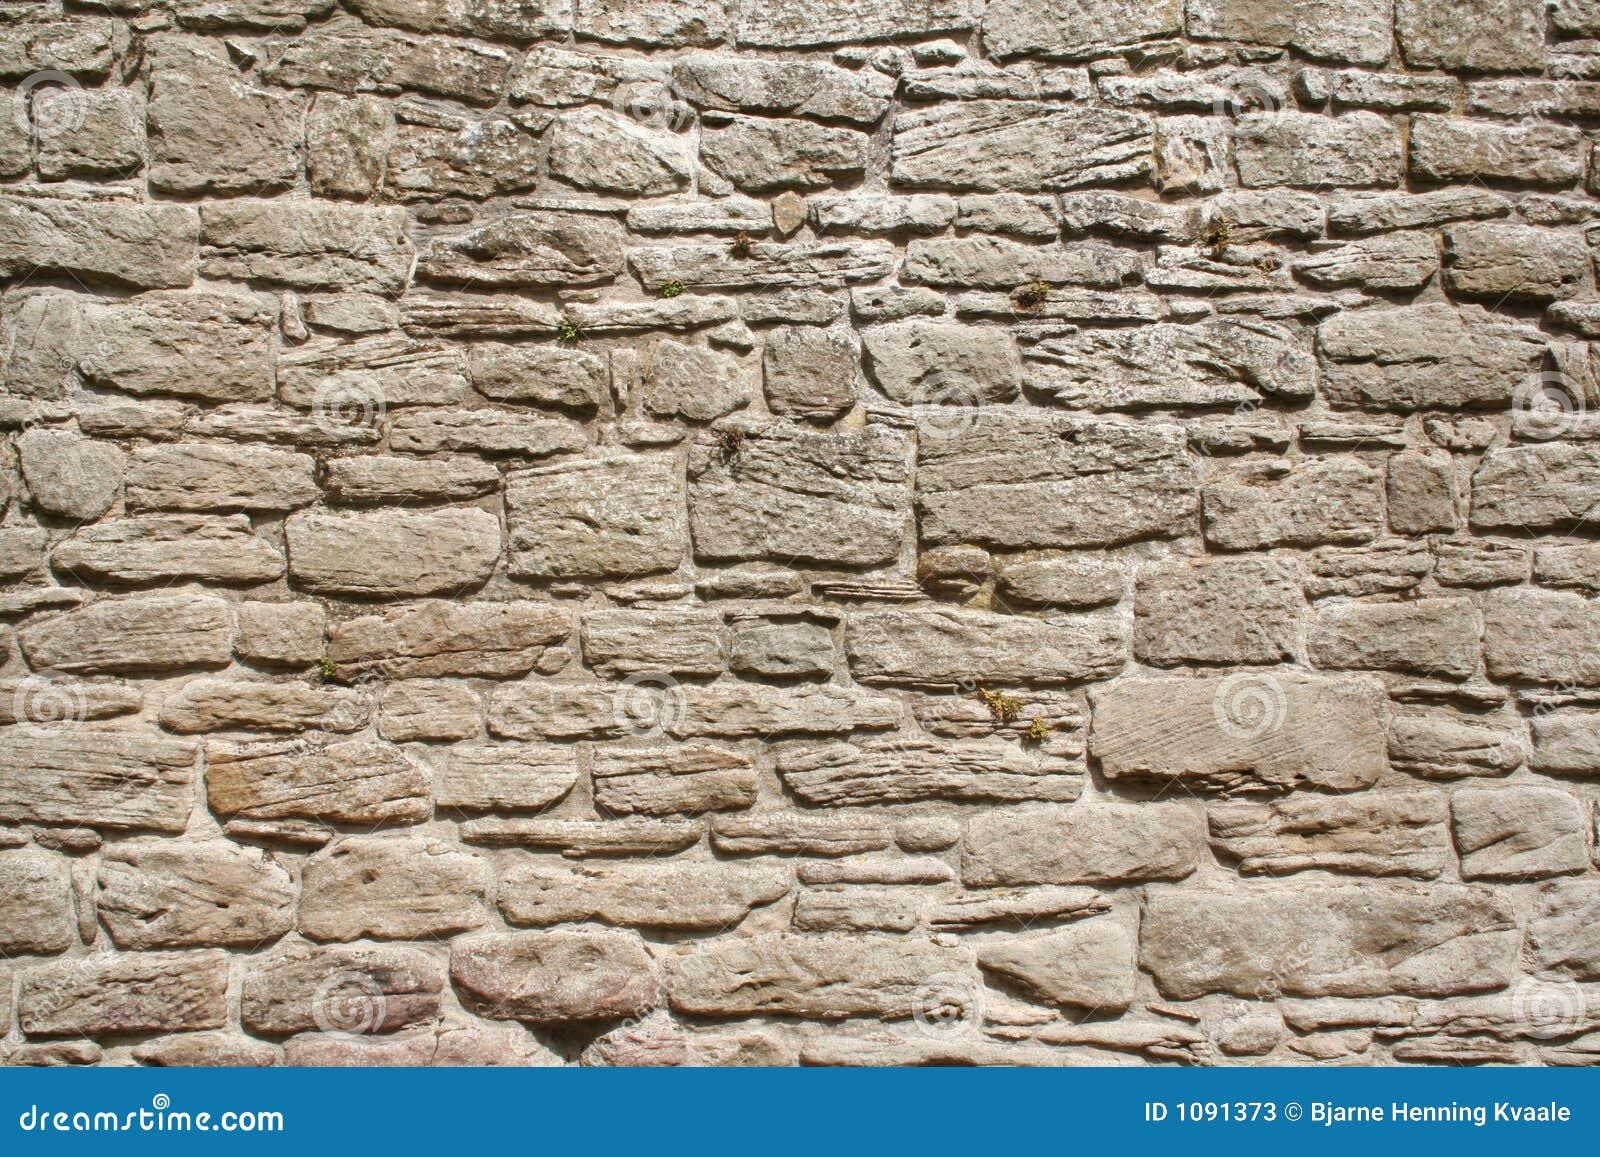 Graue 3d steinwand – sehremini